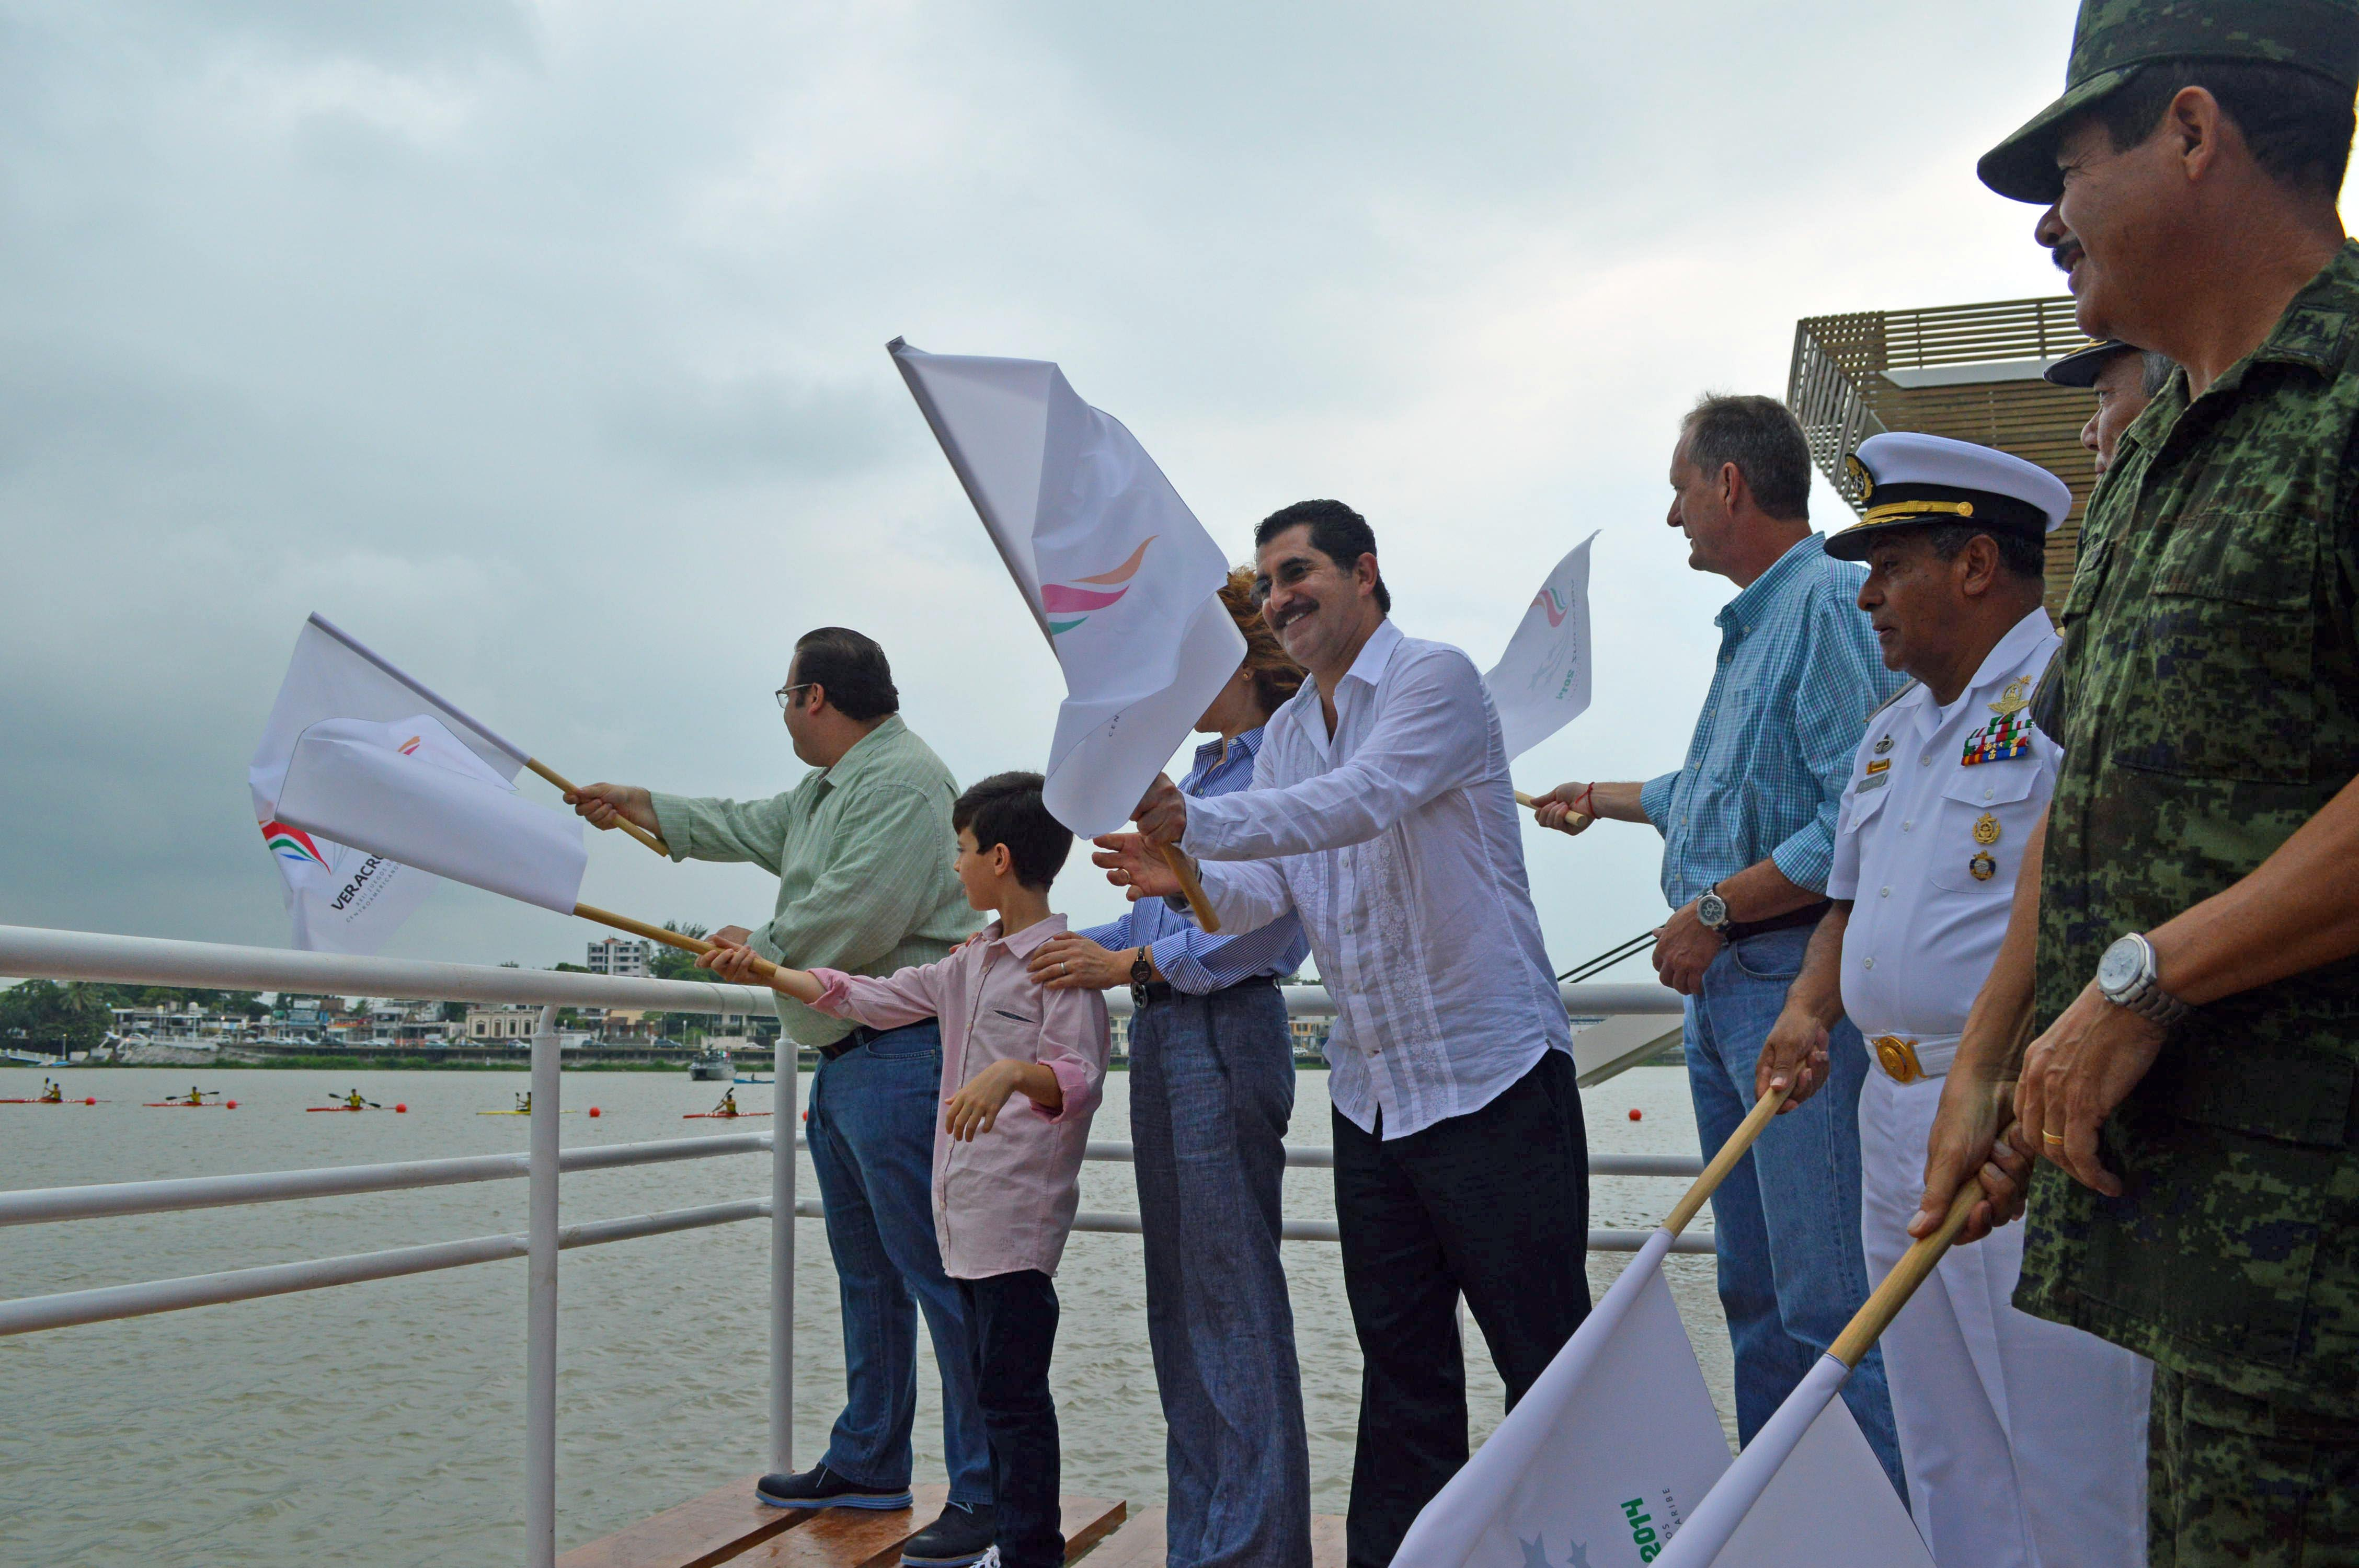 Entregan pista de Canotaje para Veracruz 2014